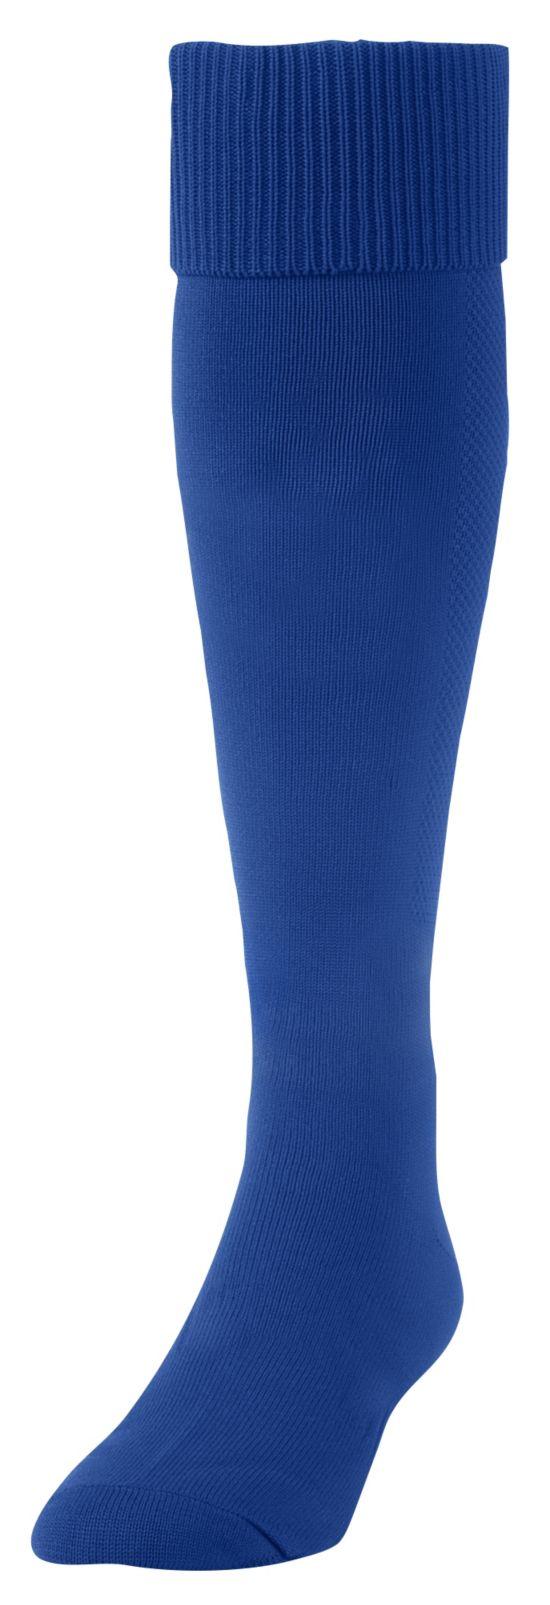 Serge Soccer Socks